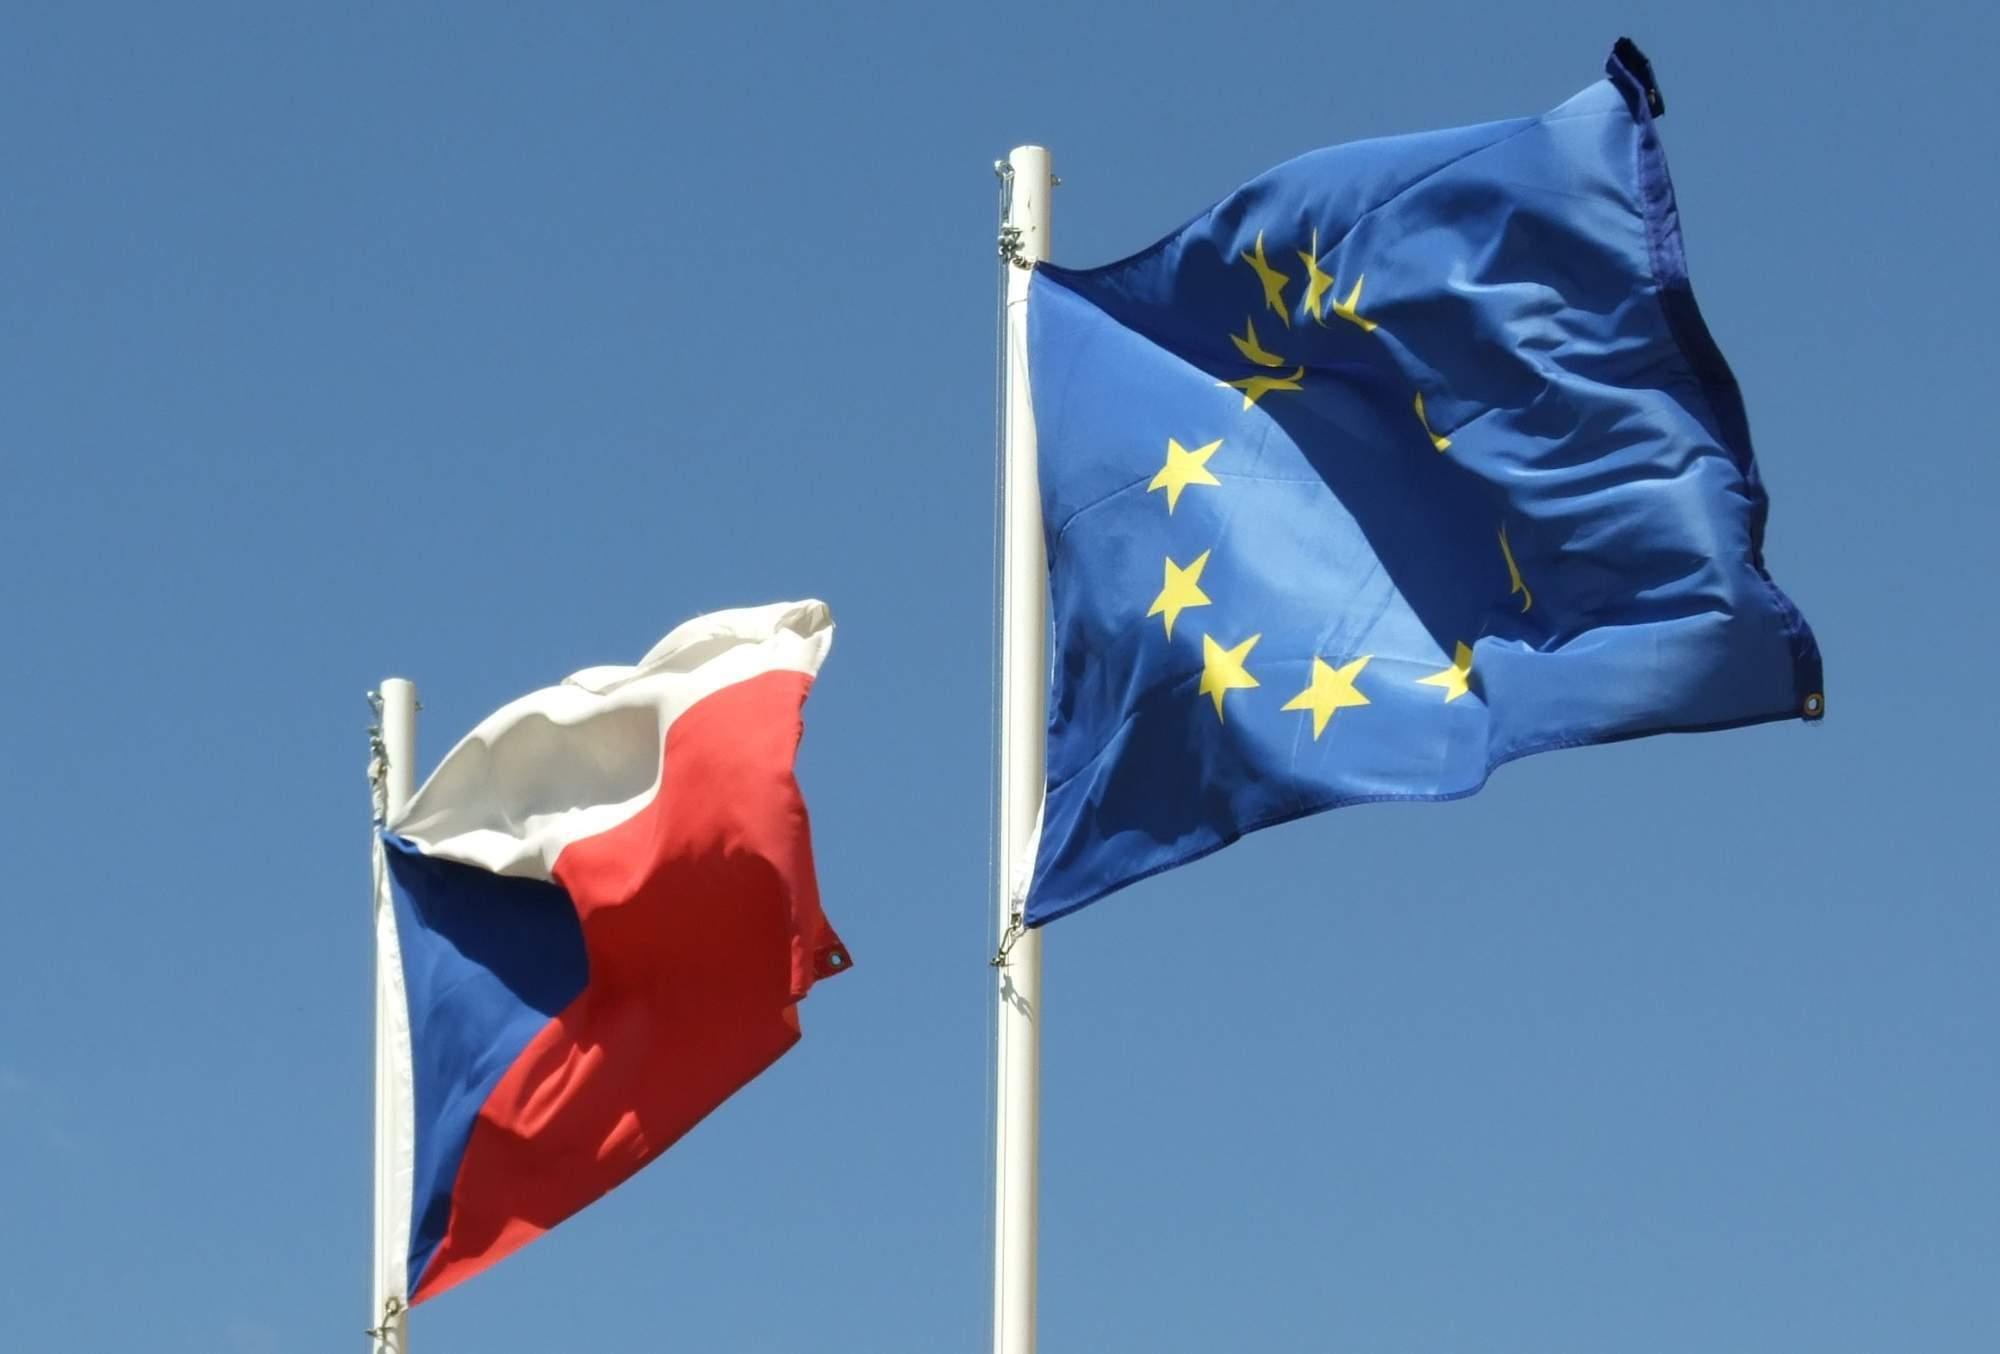 Vlajka České republiky a Evropské unie. Zdroj: Wikipedia Commons